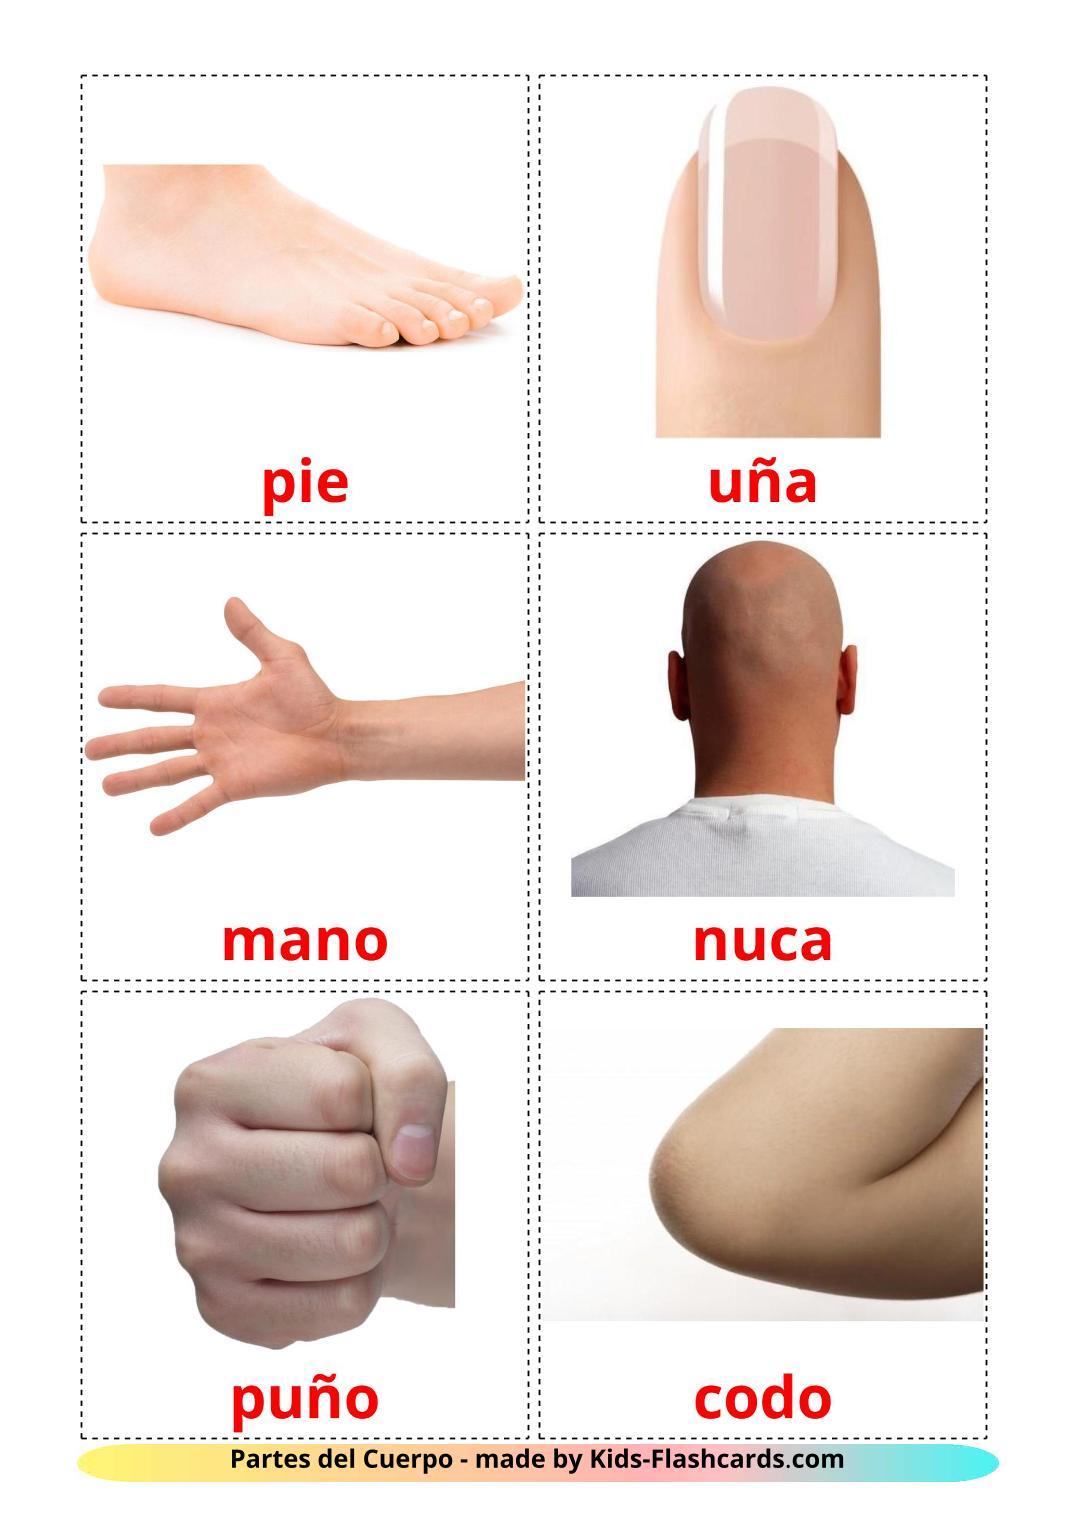 Body Parts - 26 Free Printable spanish Flashcards